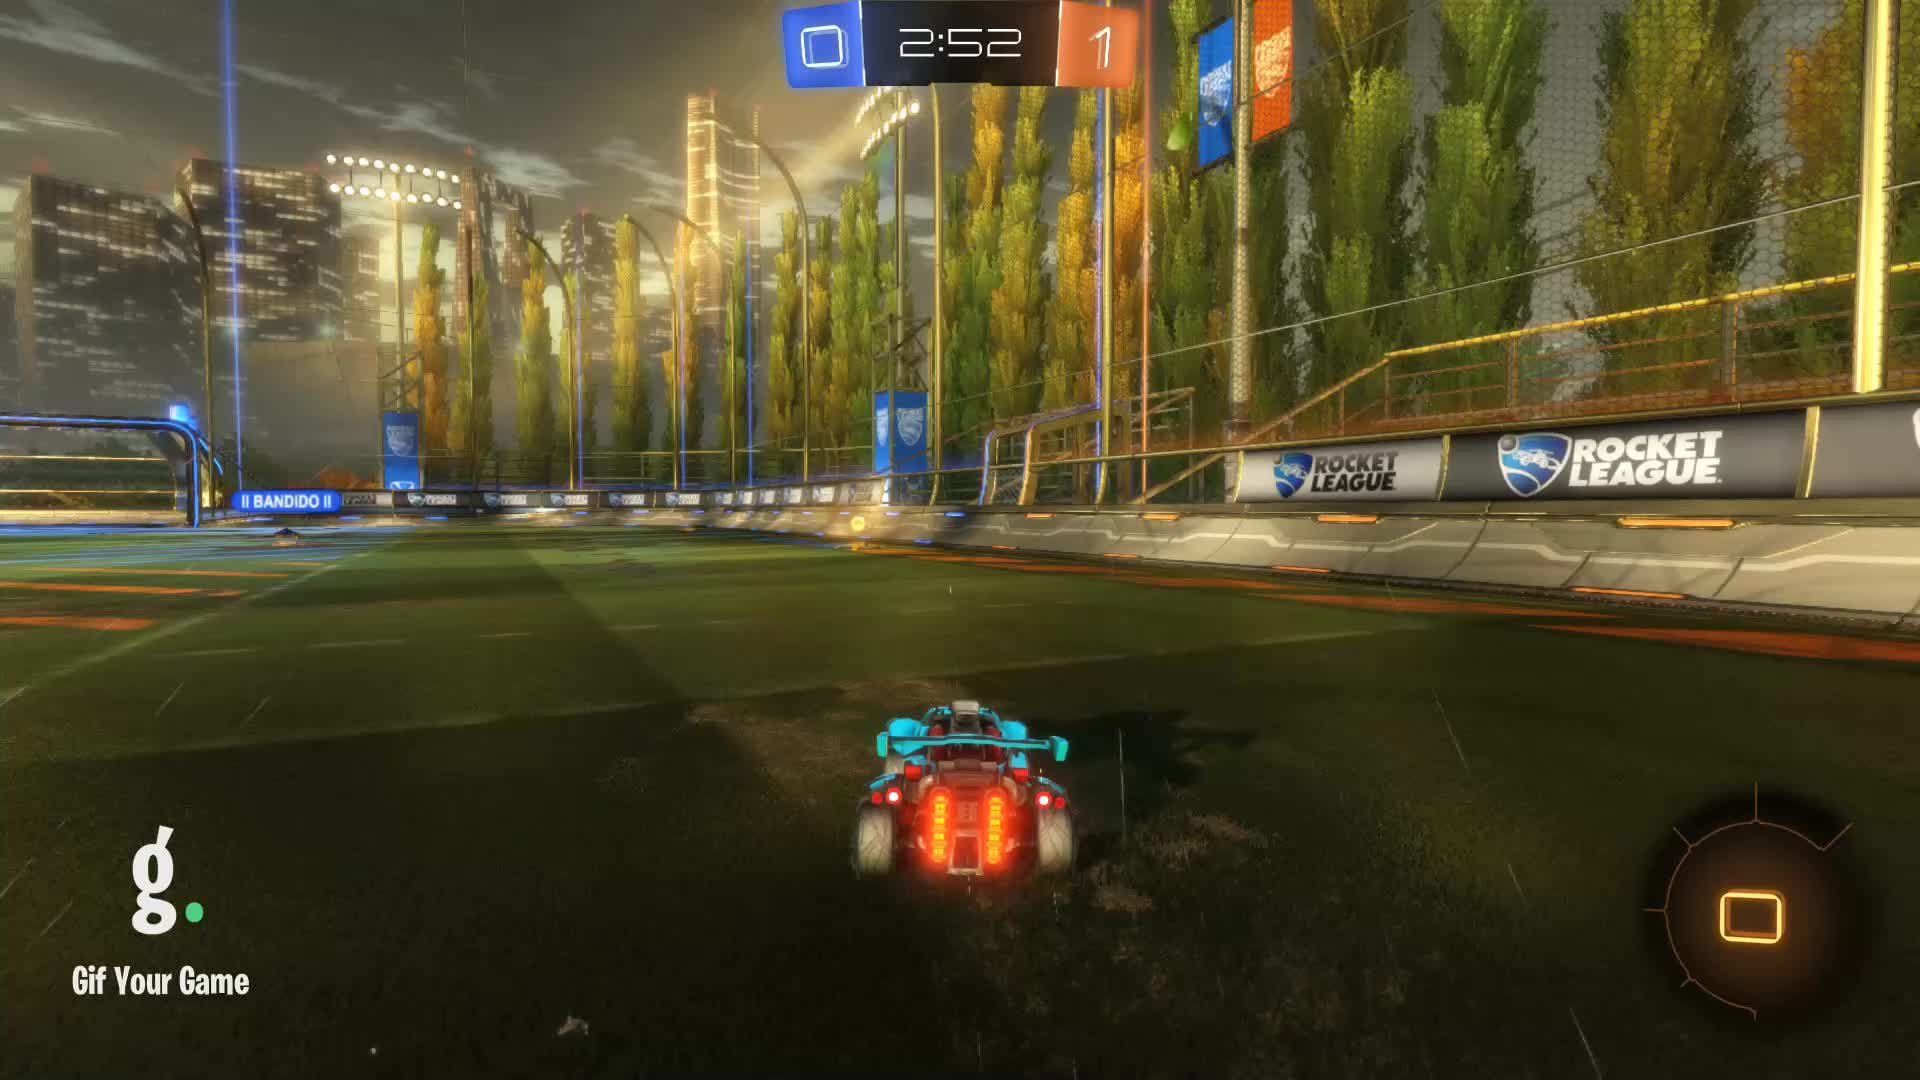 Gif Your Game, GifYourGame, Goal, Rocket League, RocketLeague, datboi, Goal 1: datboi GIFs